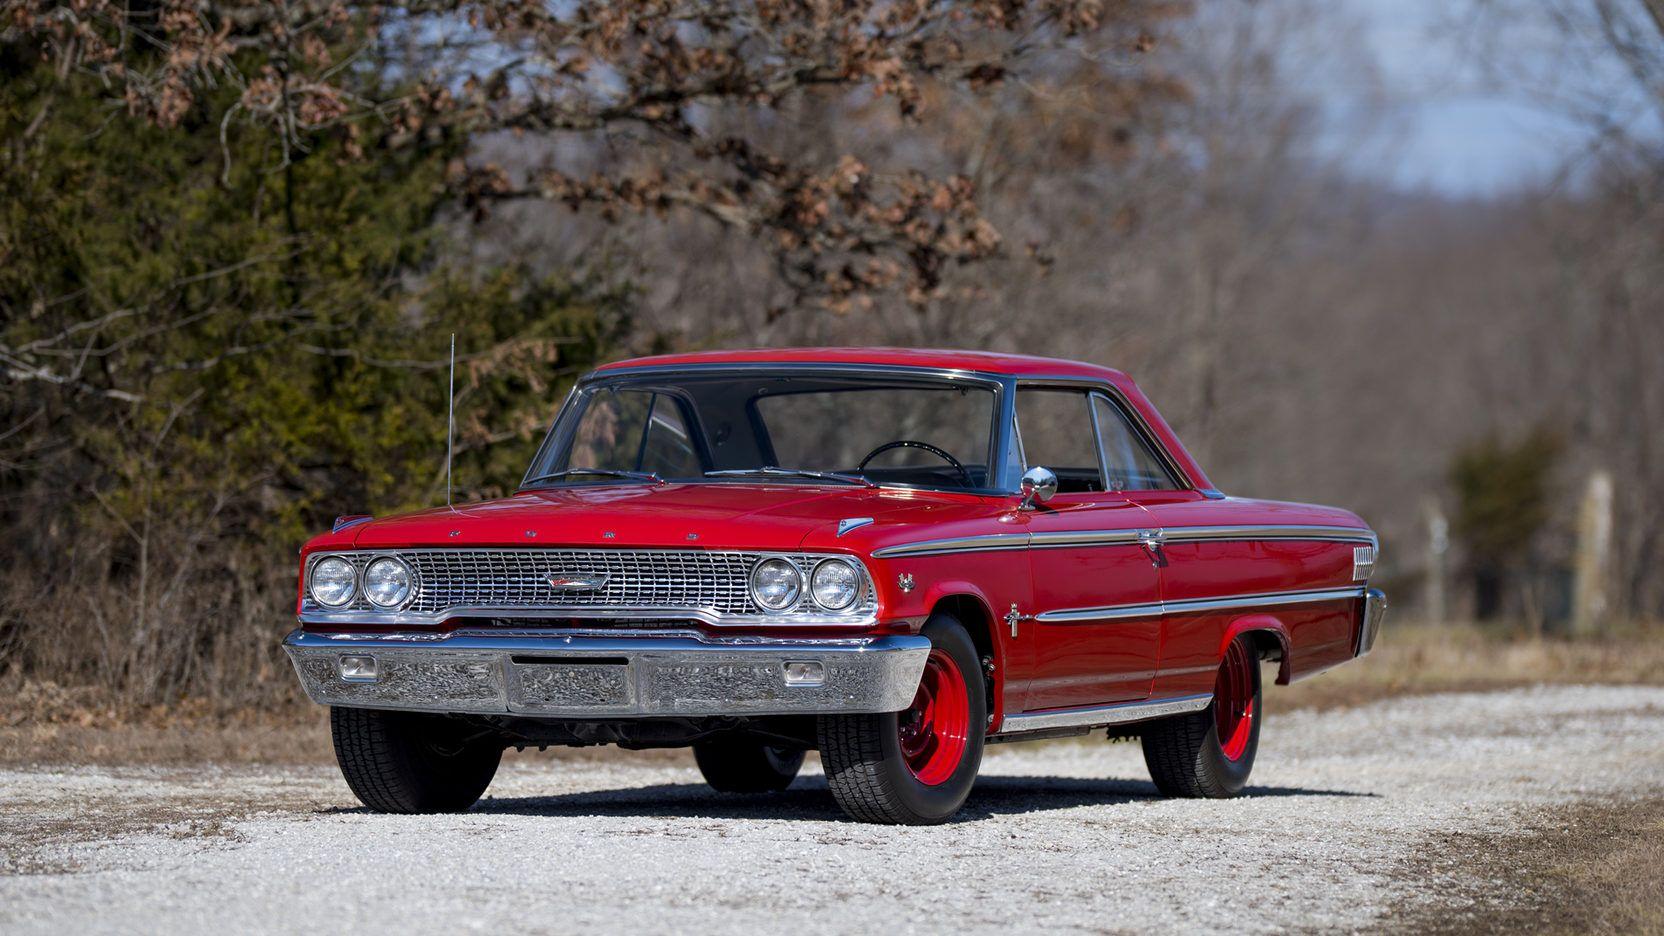 1963 Ford Galaxie 500, 427 2x4bbl V8/T10 4speed/4.00 9\